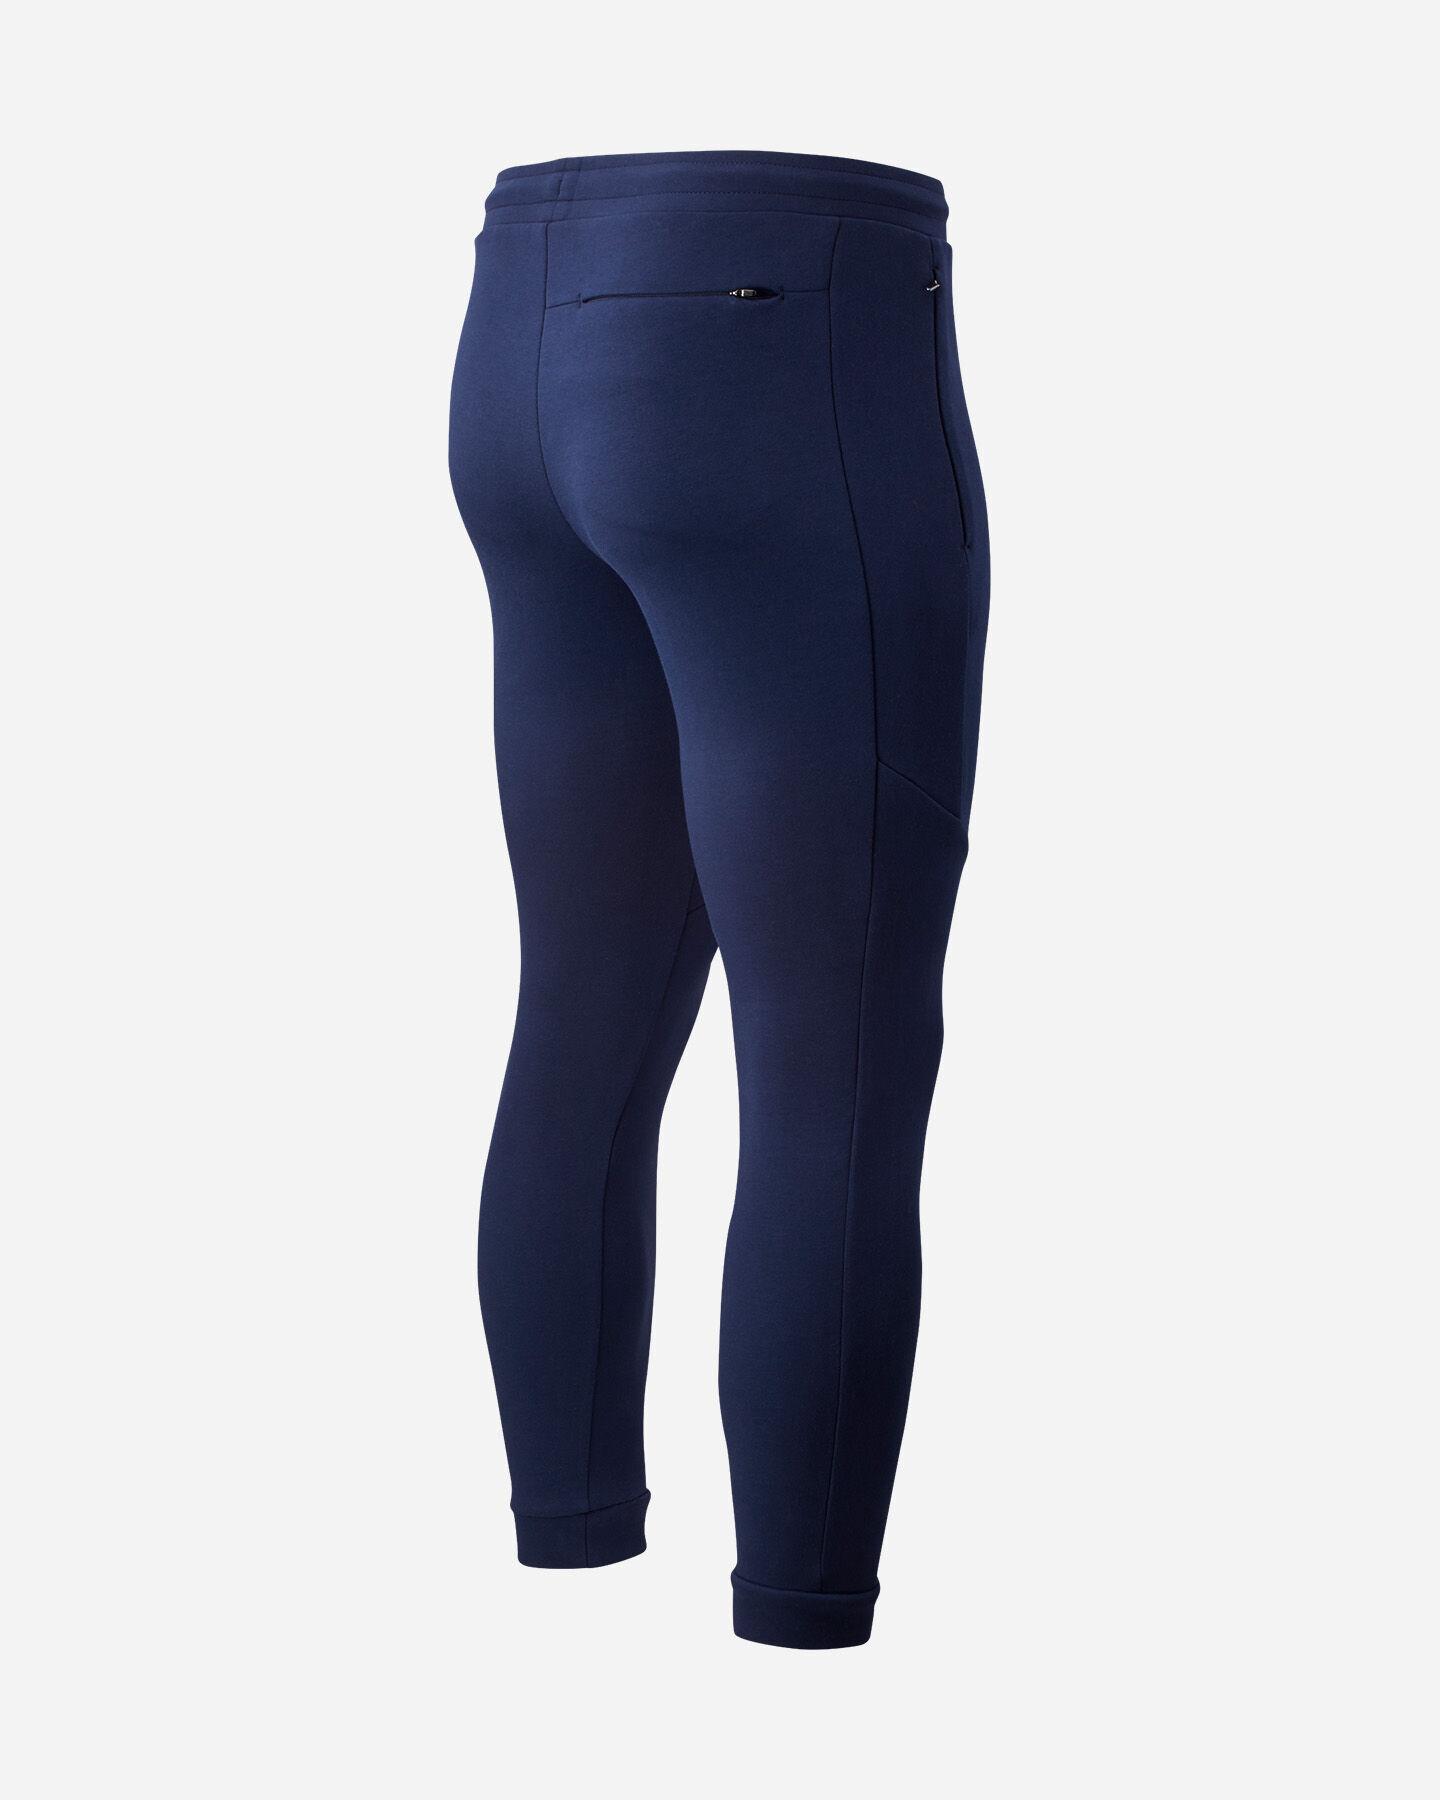 Pantalone NEW BALANCE CORE SLIM M S5166132 scatto 5